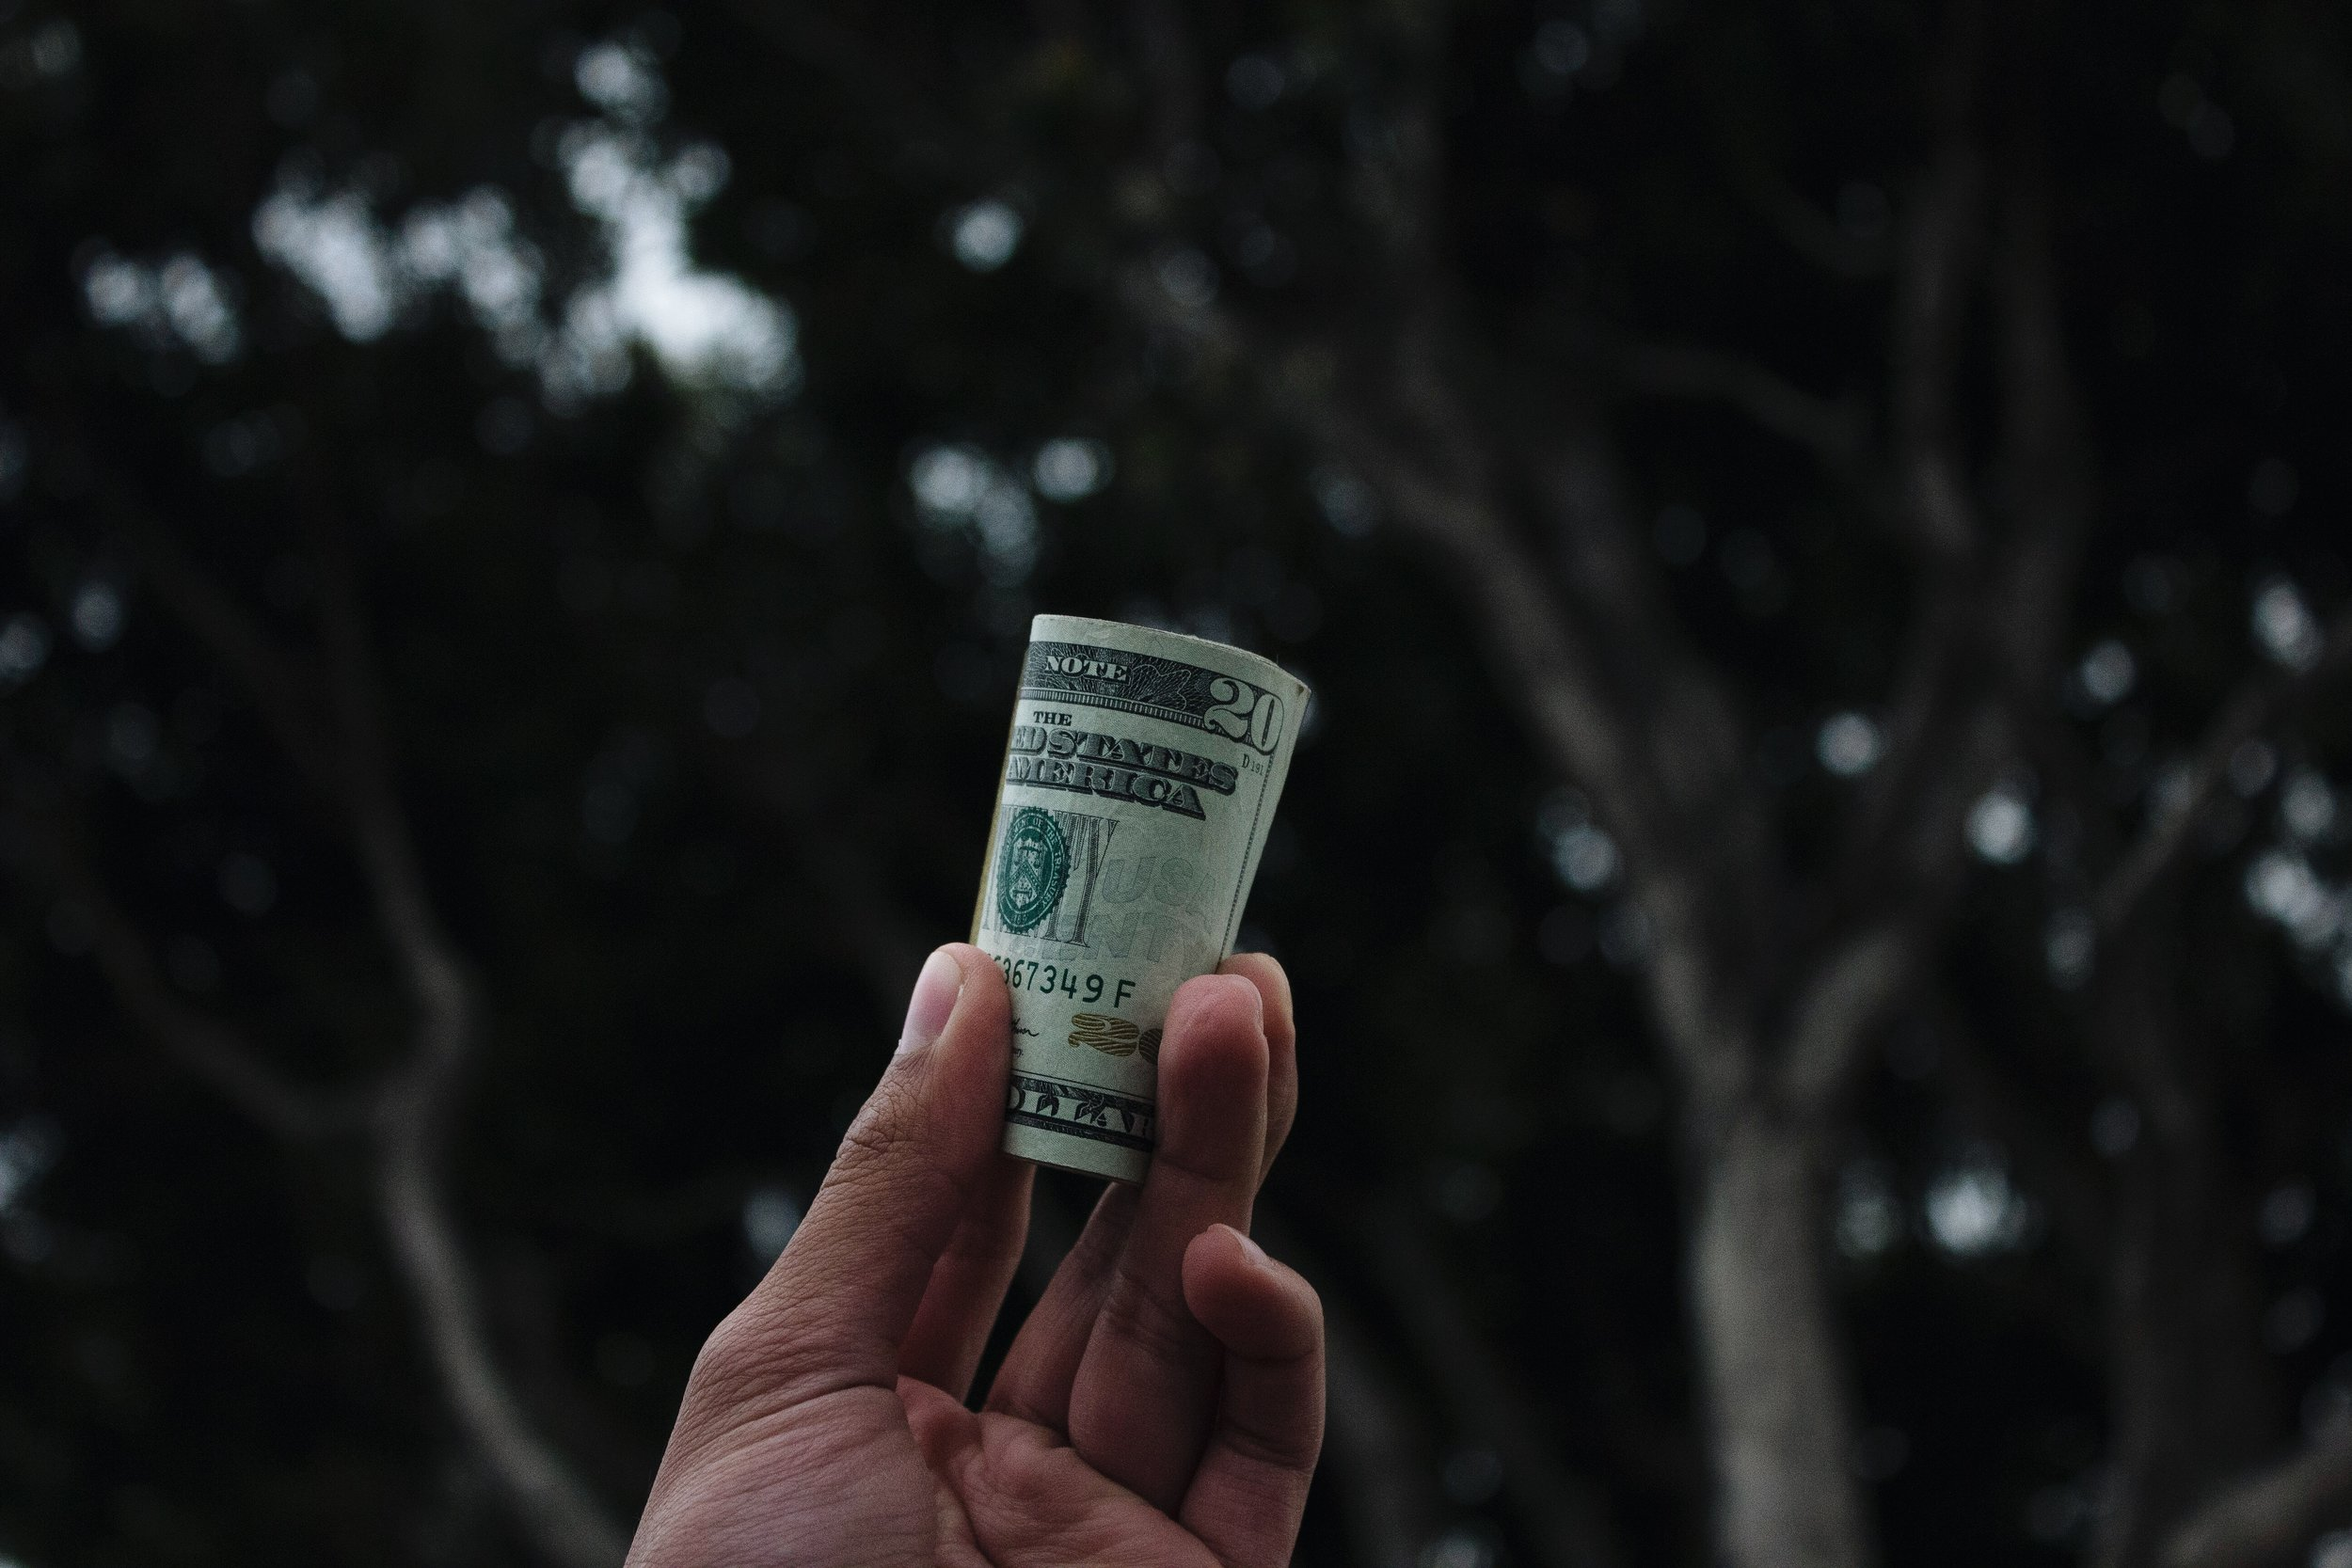 How+Can+Sensors+Help+Me+Make+Money+Pic.jpg